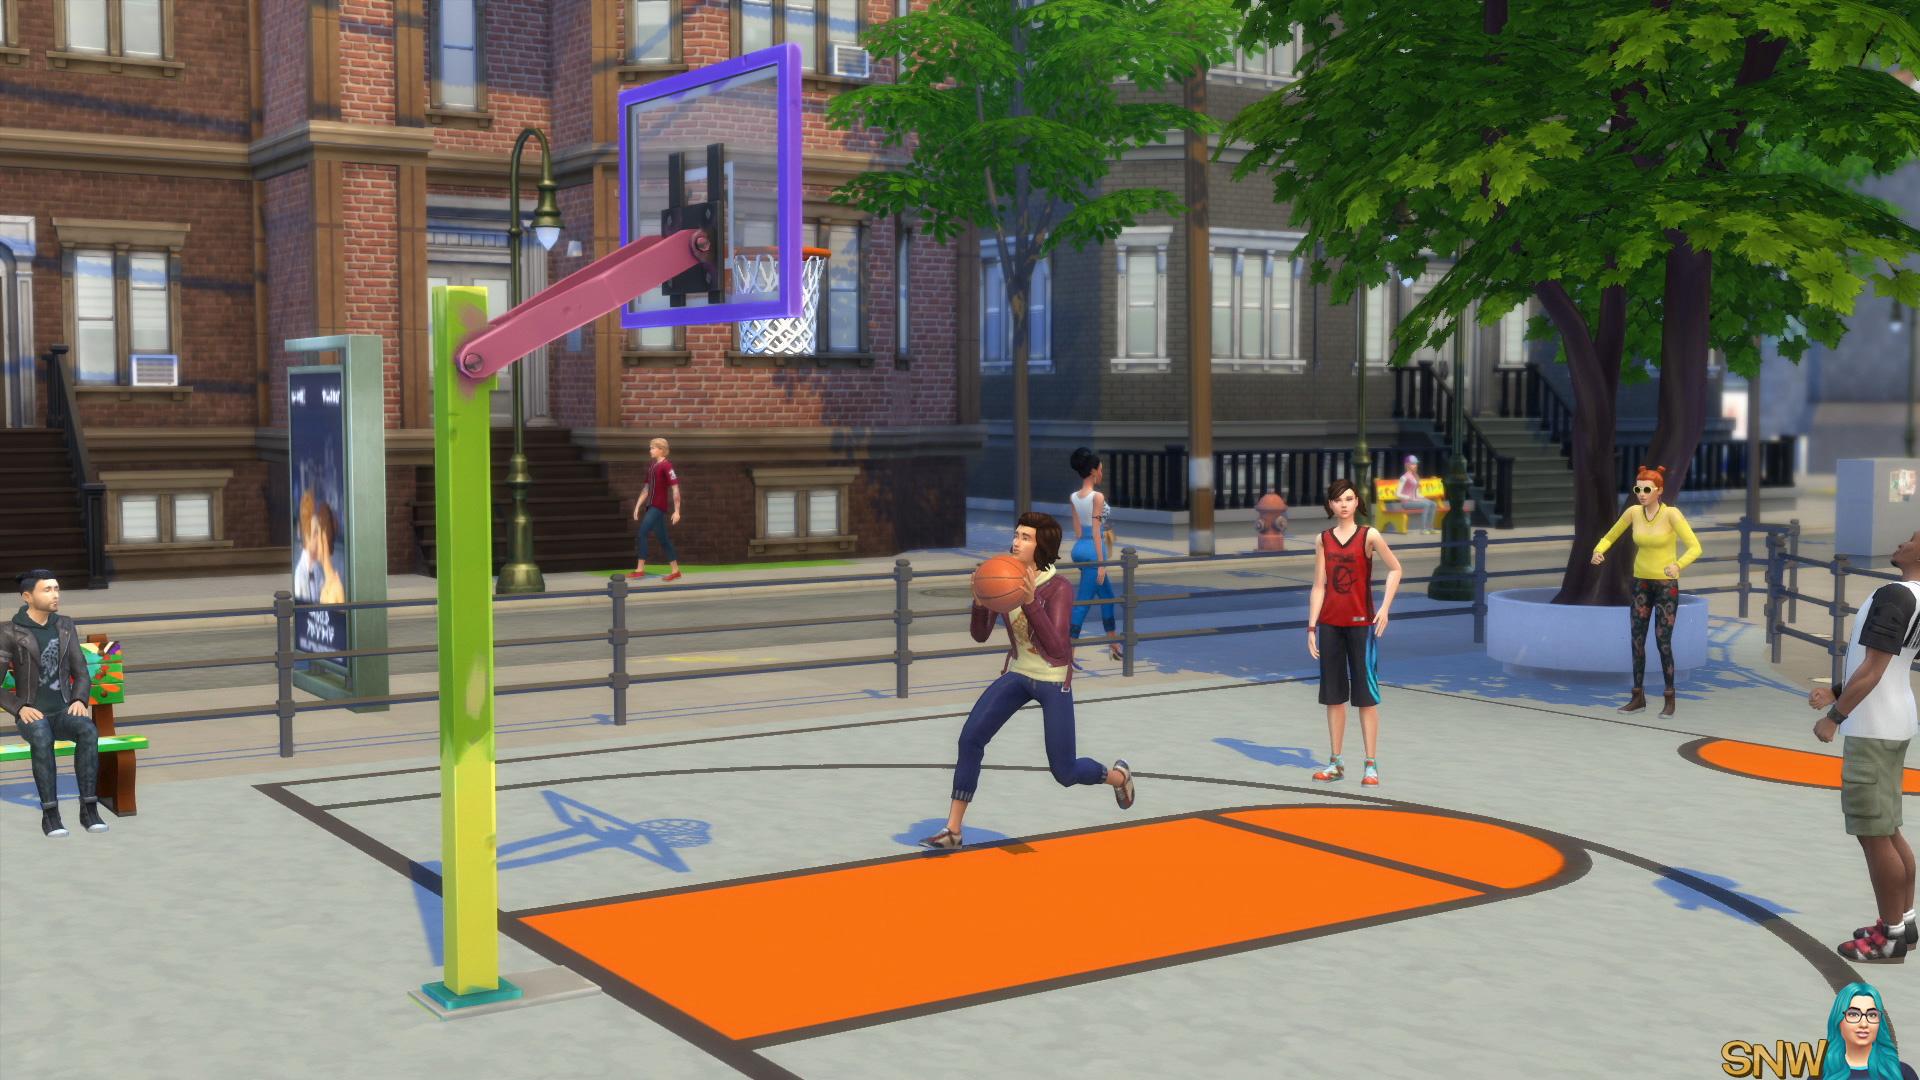 The Sims 4: City Living screenshot